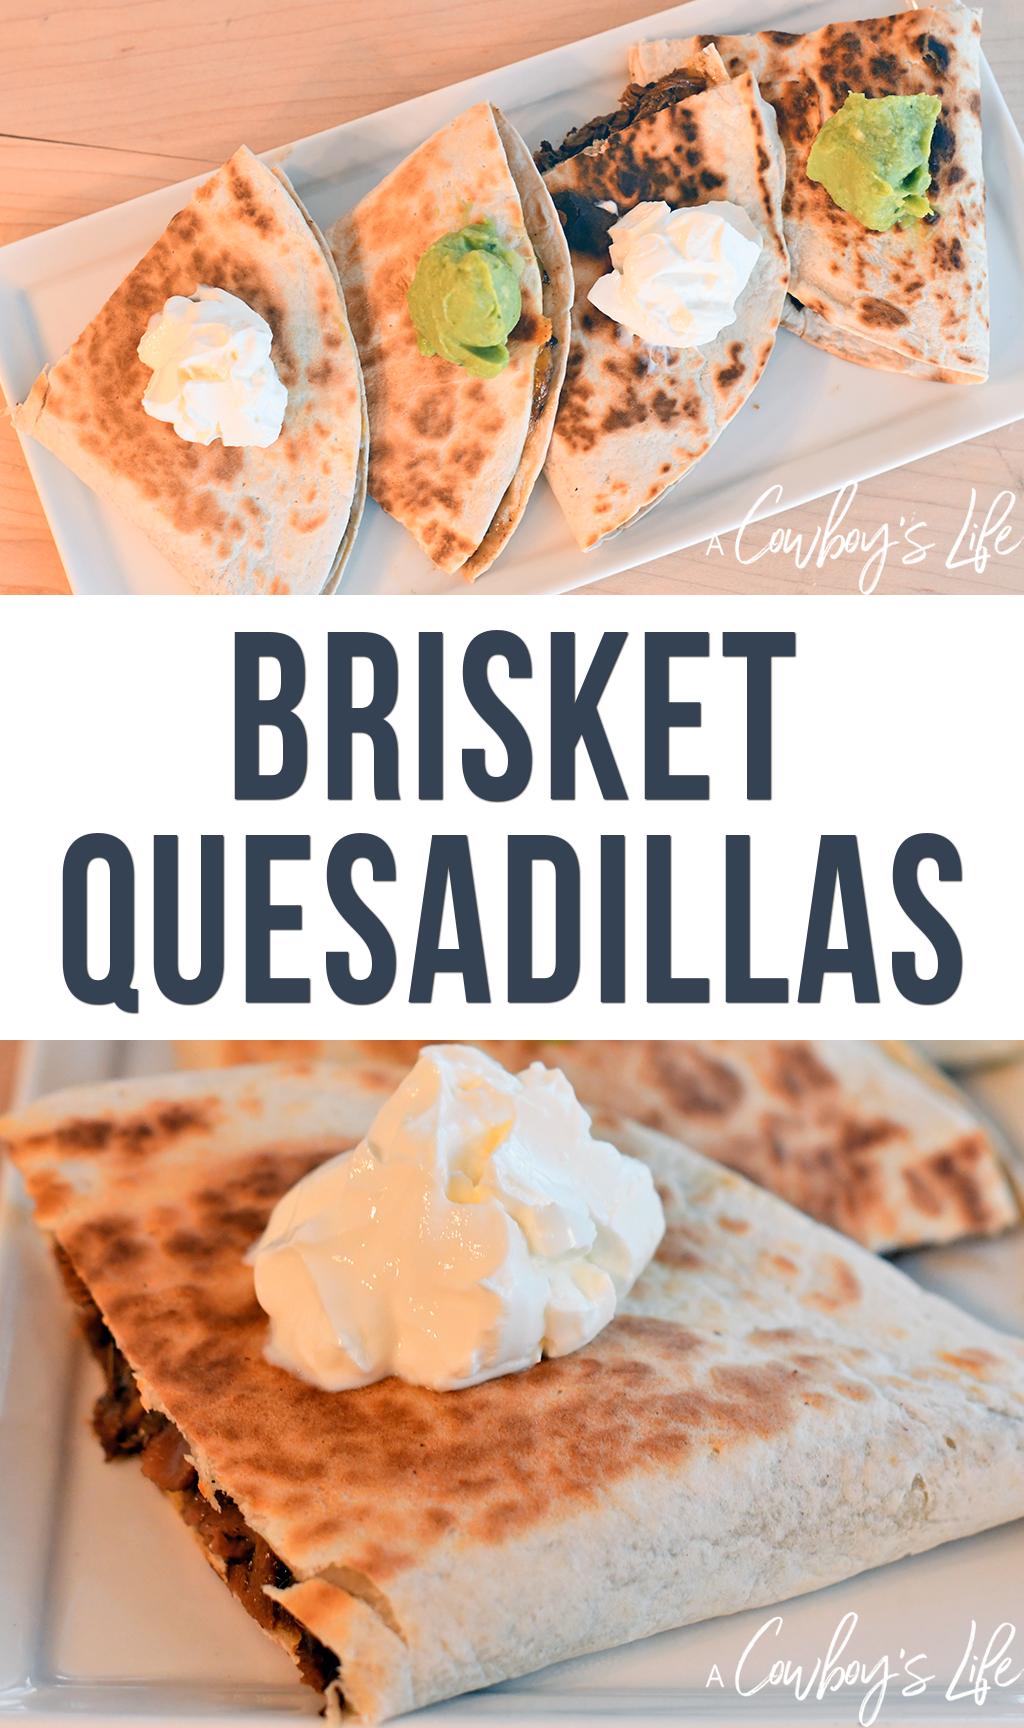 How to make brisket quesadillas